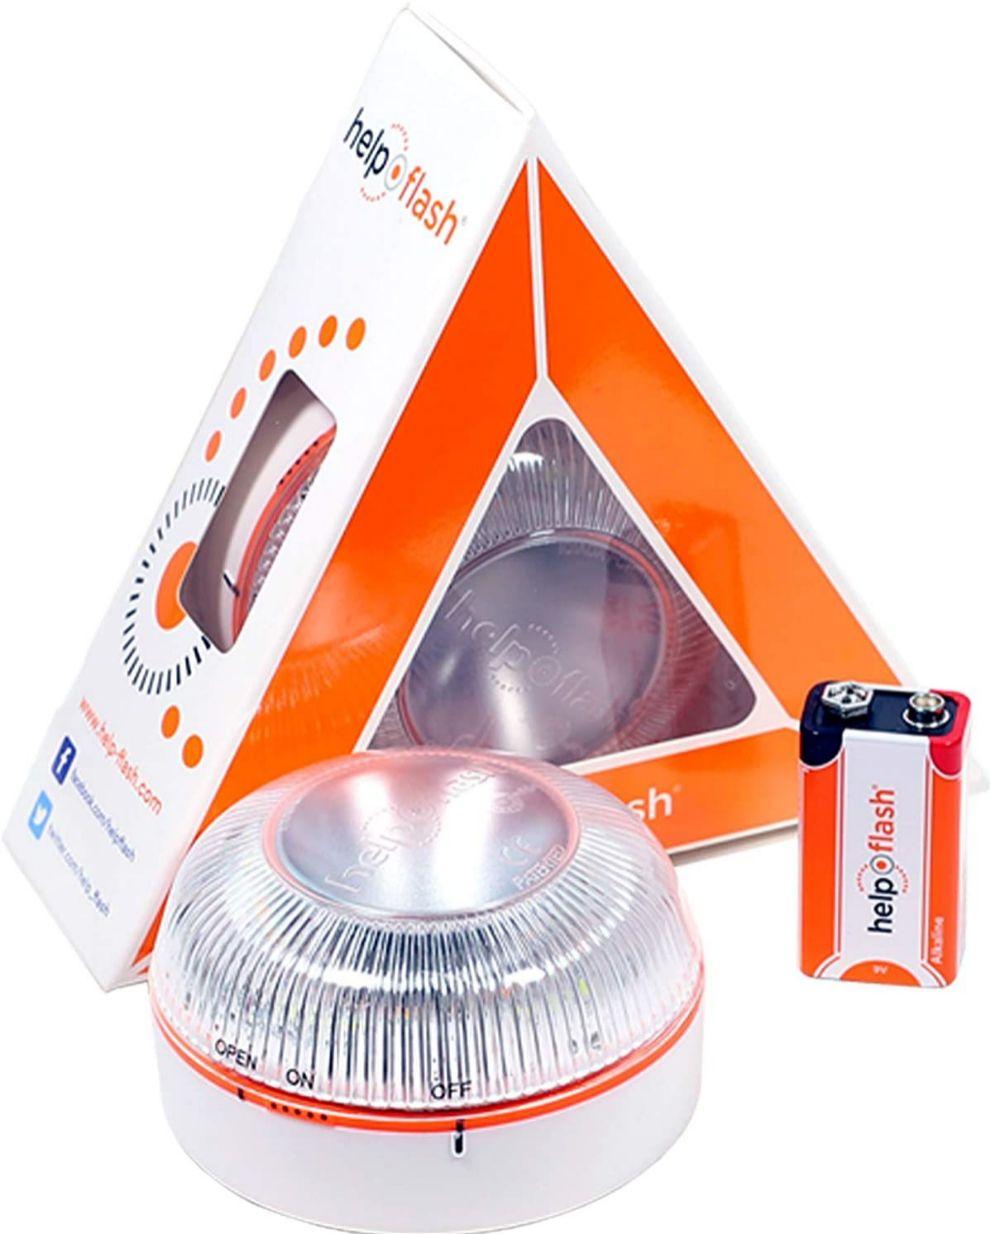 Luz V16 - señal V-16 - DGT - Amazon Prime Day - ofertas - triángulos